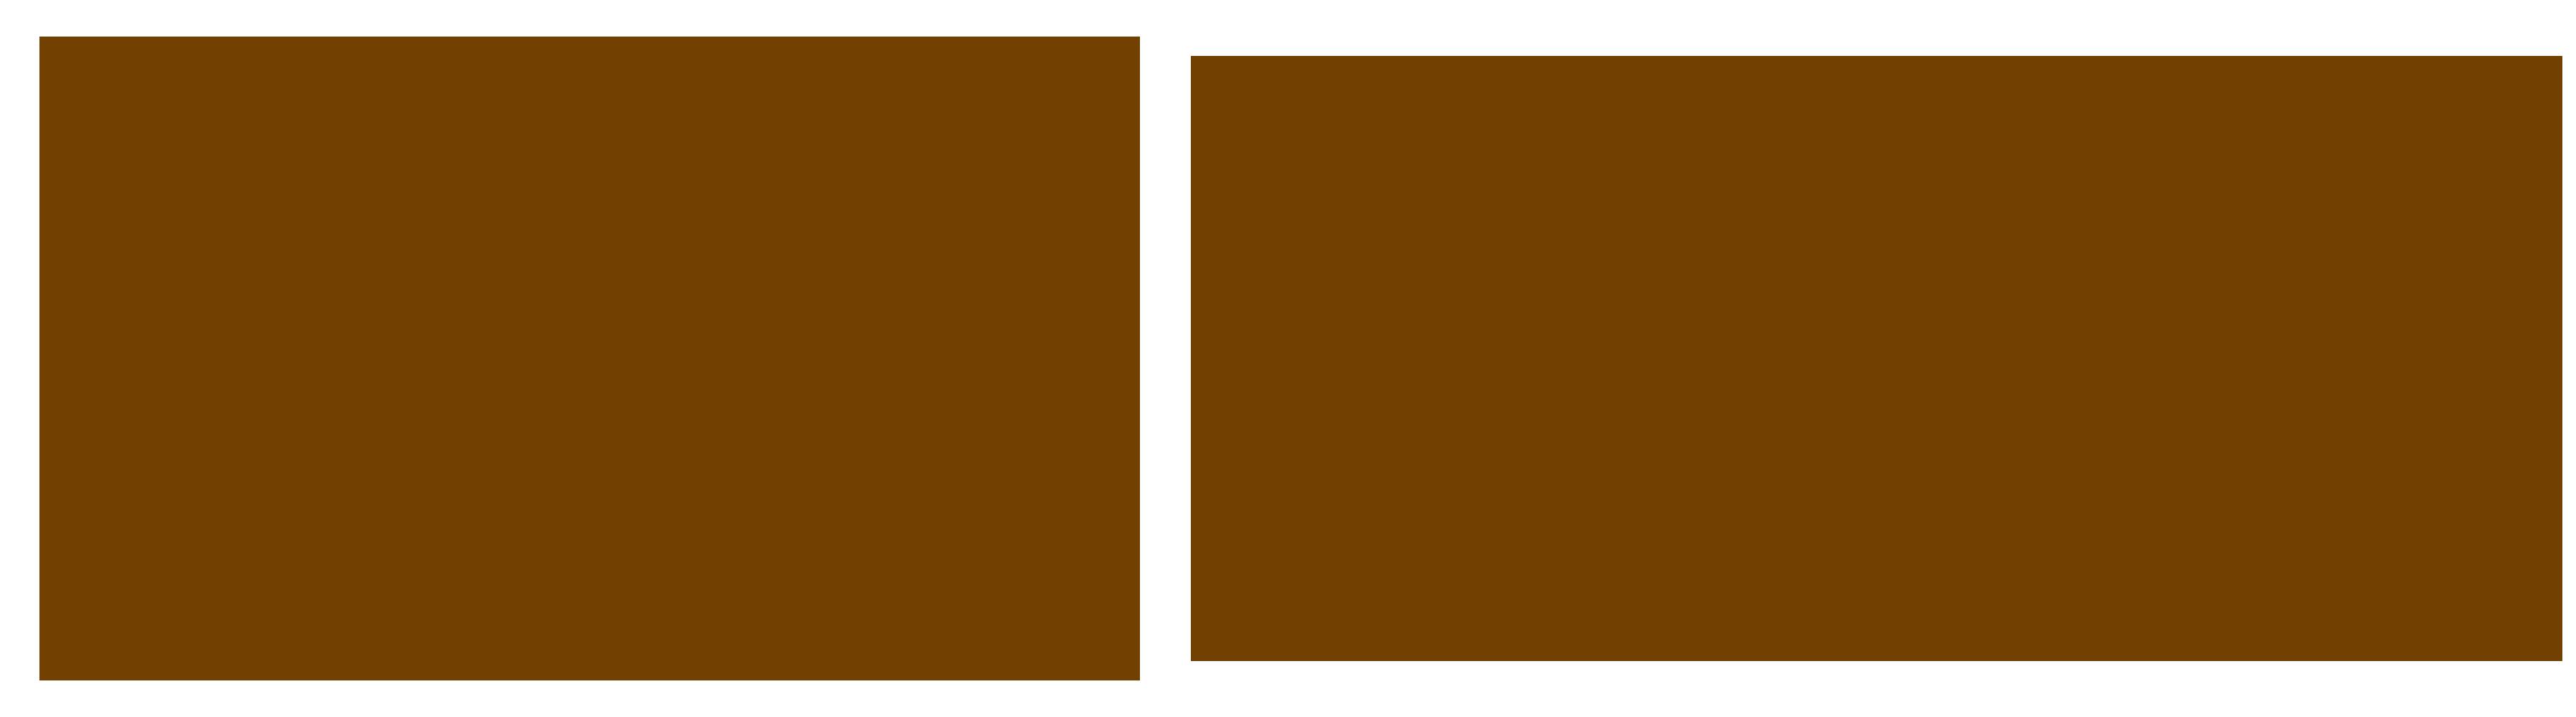 Laras Kantinchen